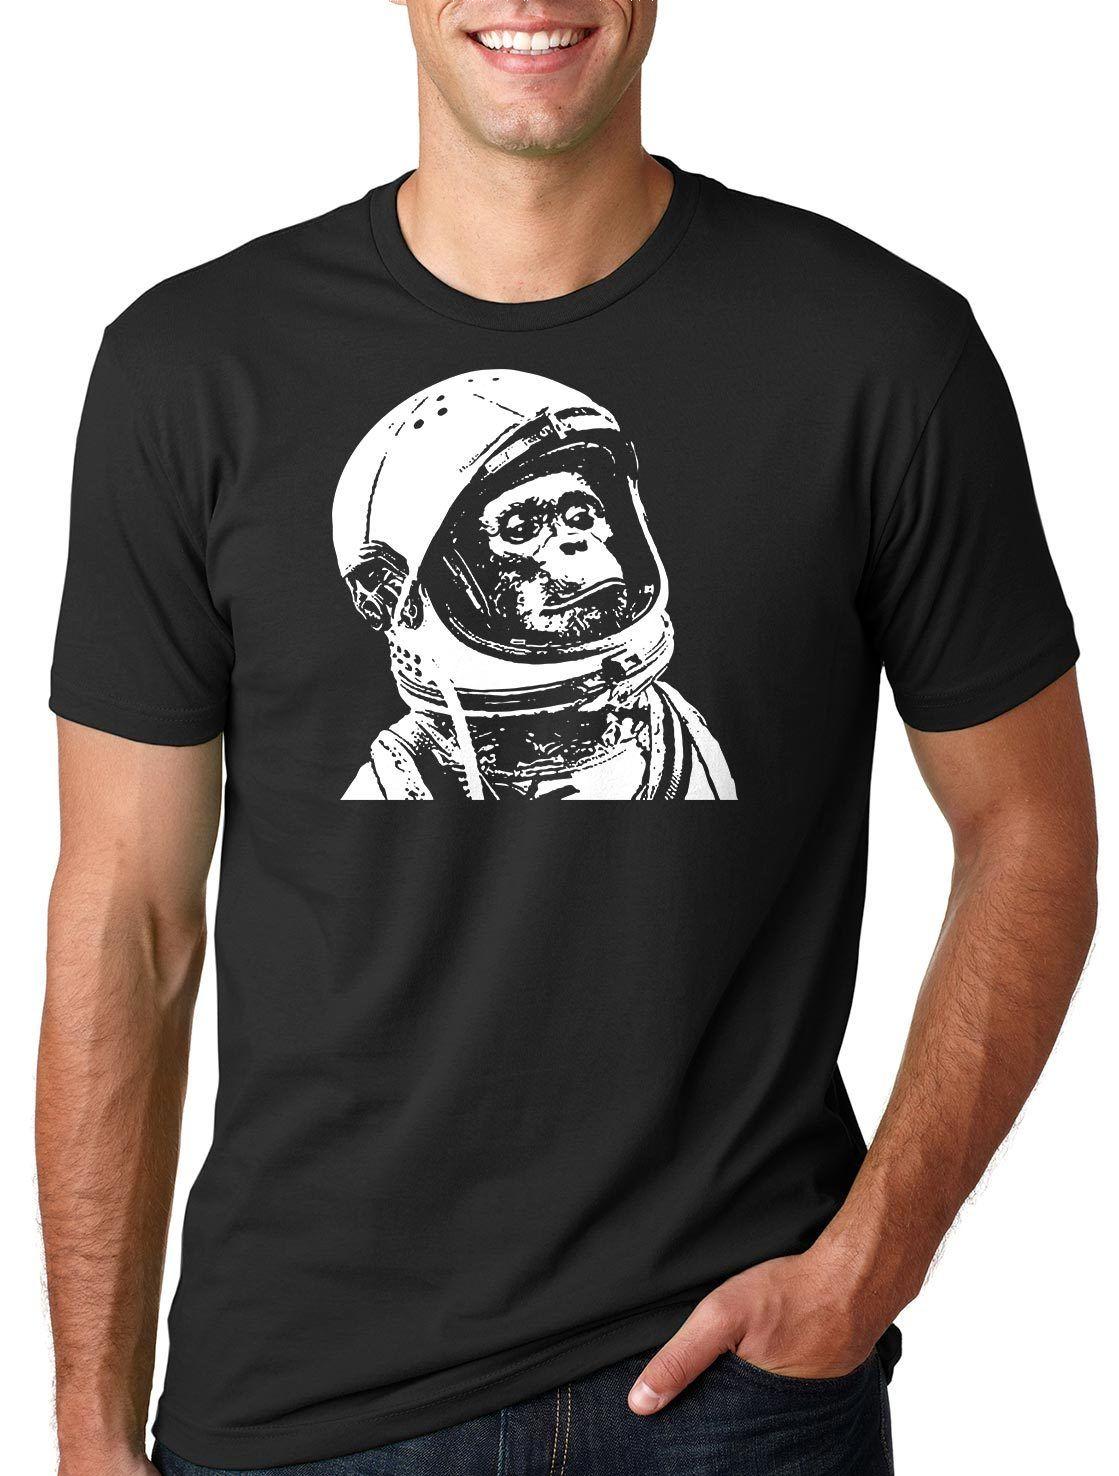 Geek gracioso astronauta chimpancé camiseta con gráfico de mono camisa espacio mono chimpancé camiseta de dibujos animados camiseta de los hombres Unisex nueva moda camiseta